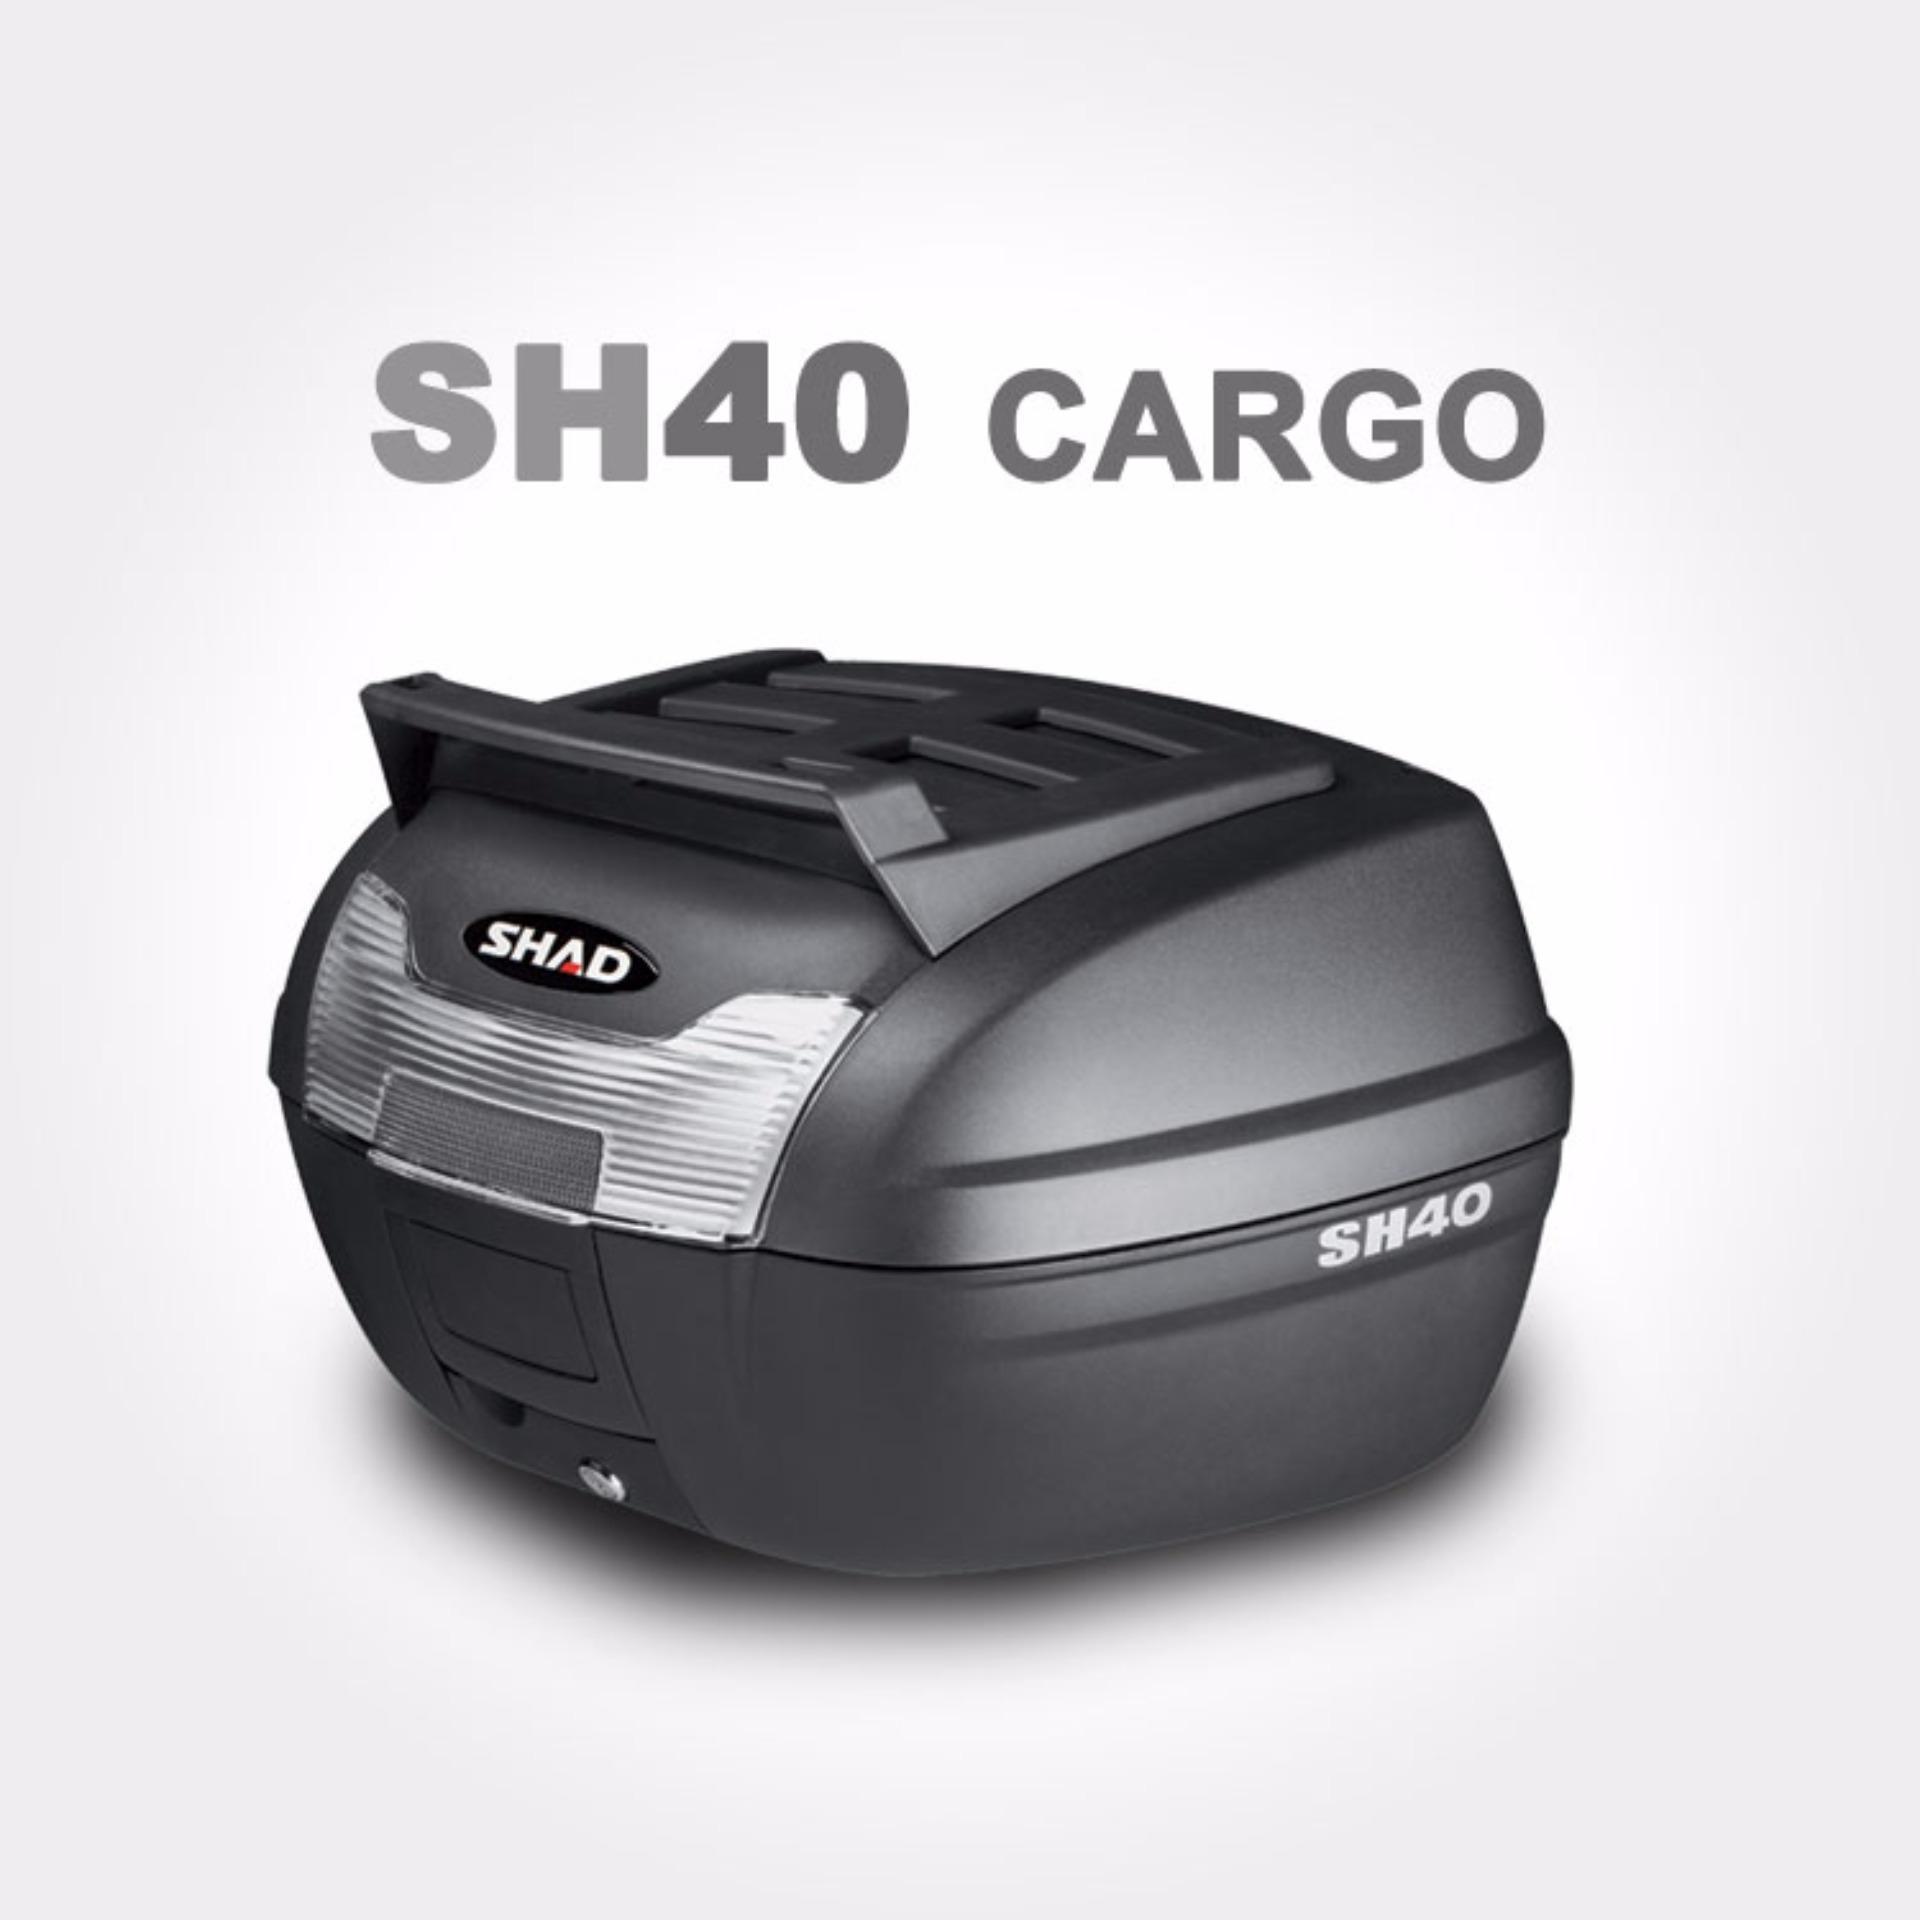 Jual Shad Sh40 Cargo Box Motor Shad Branded